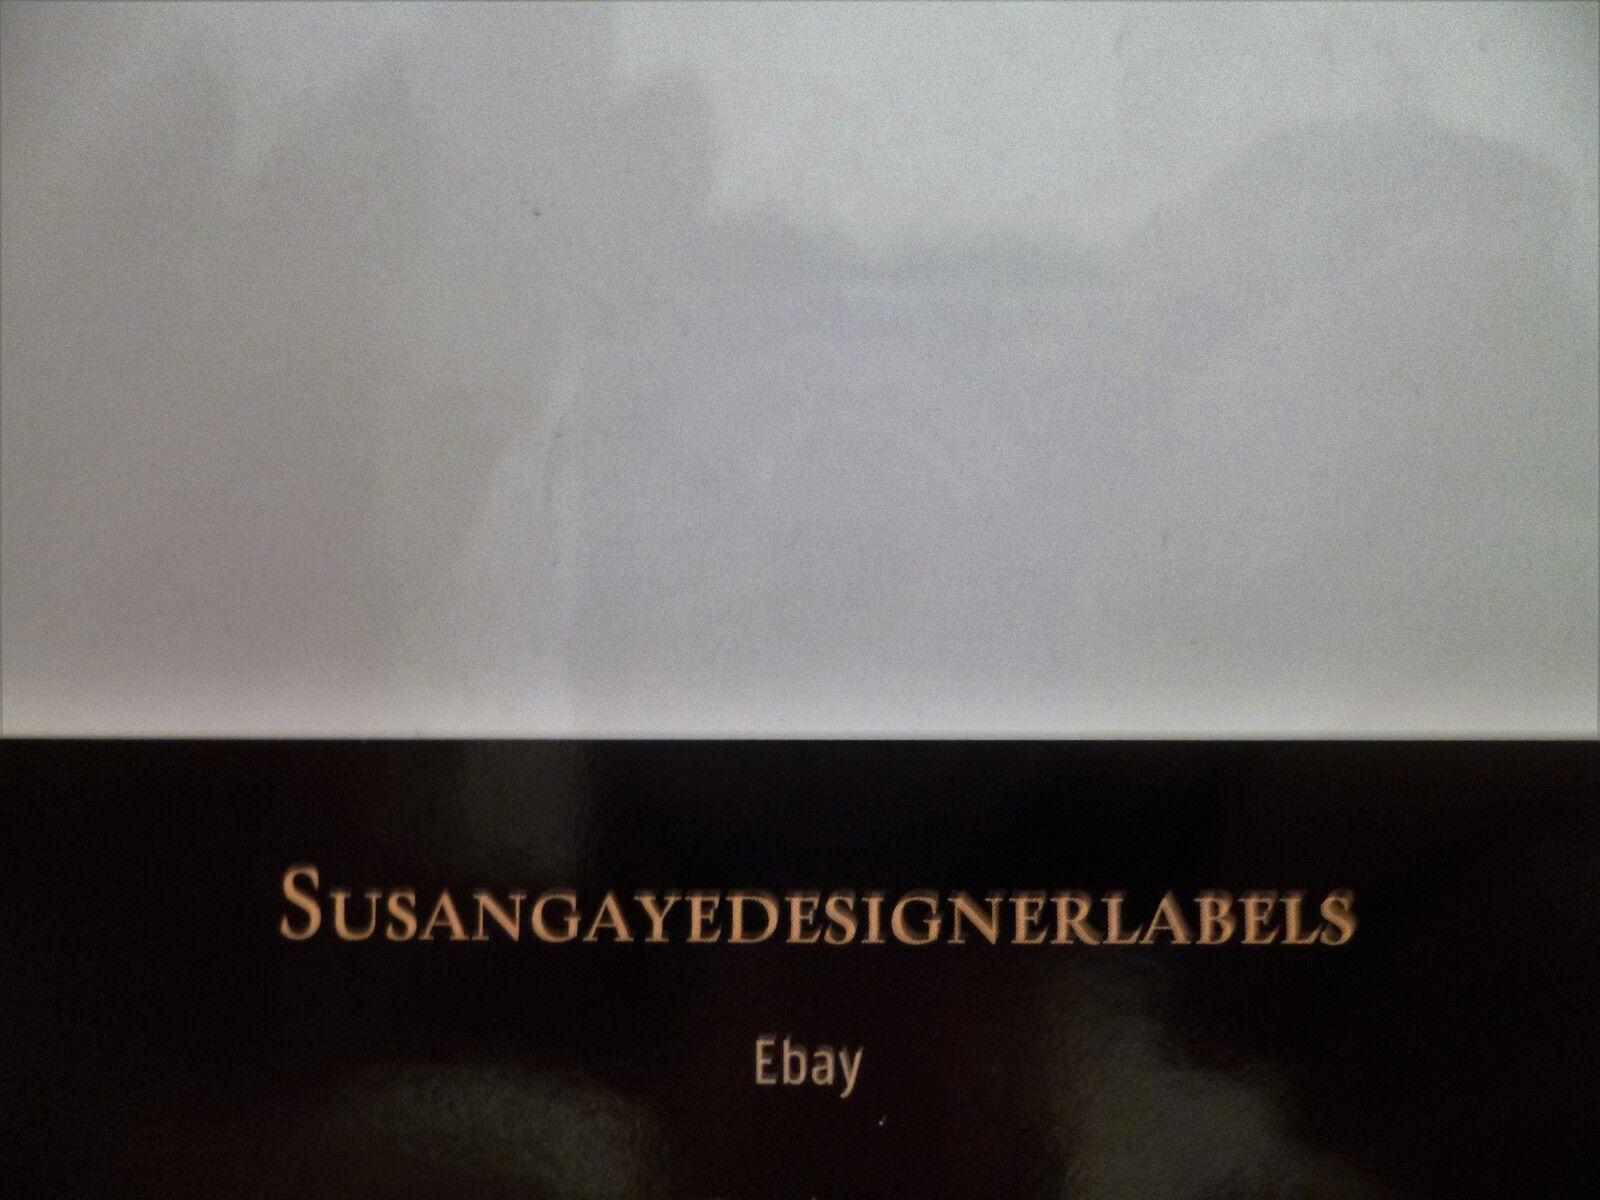 Susangayedesignerlabels